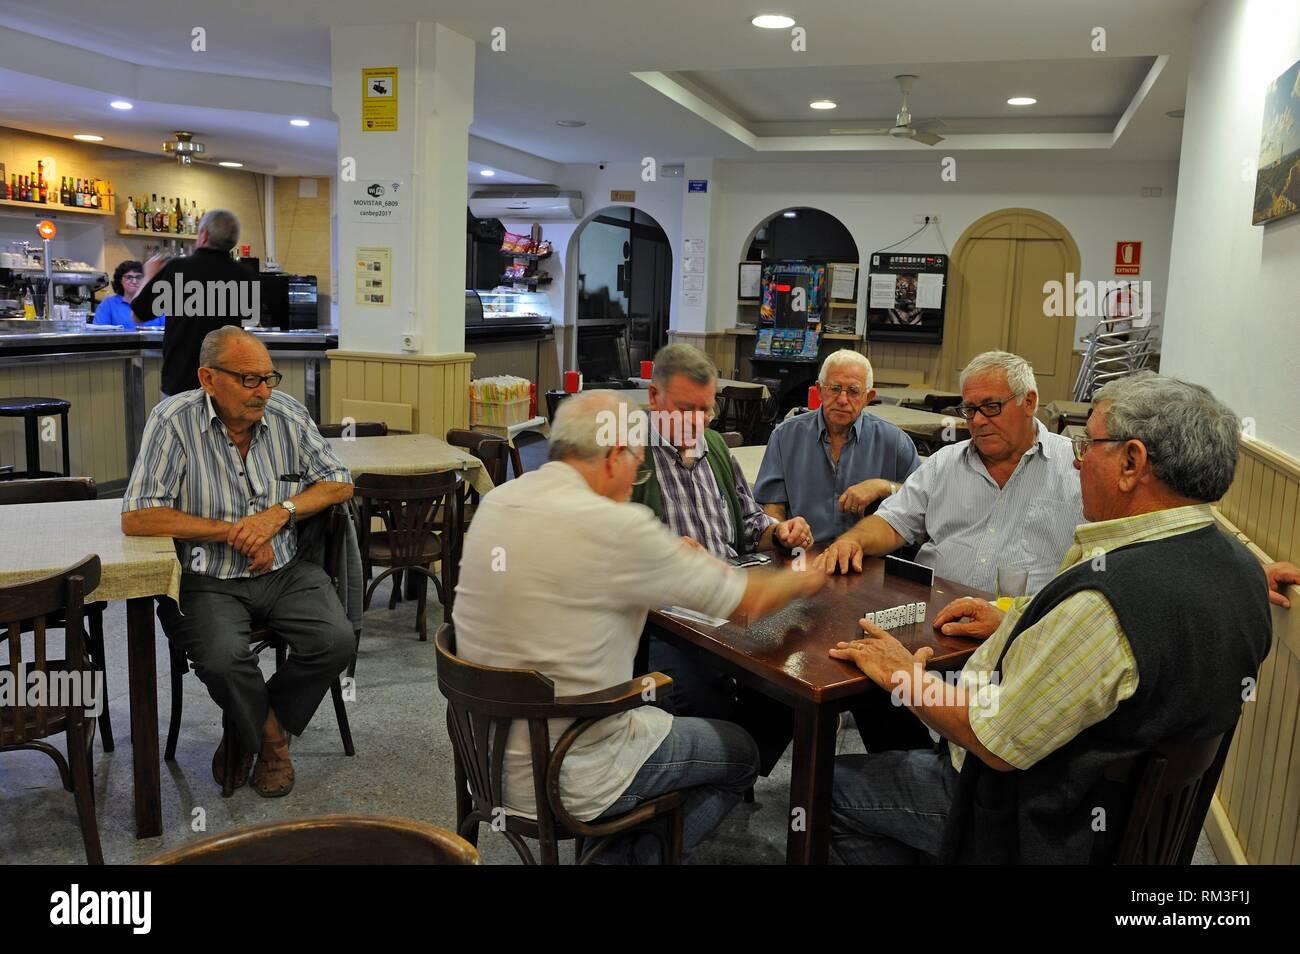 men playing domino game at Ca´n Bep cafe in the city of Es Mercadal, Menorca, Balearic Islands, Spain, Europe. - Stock Image